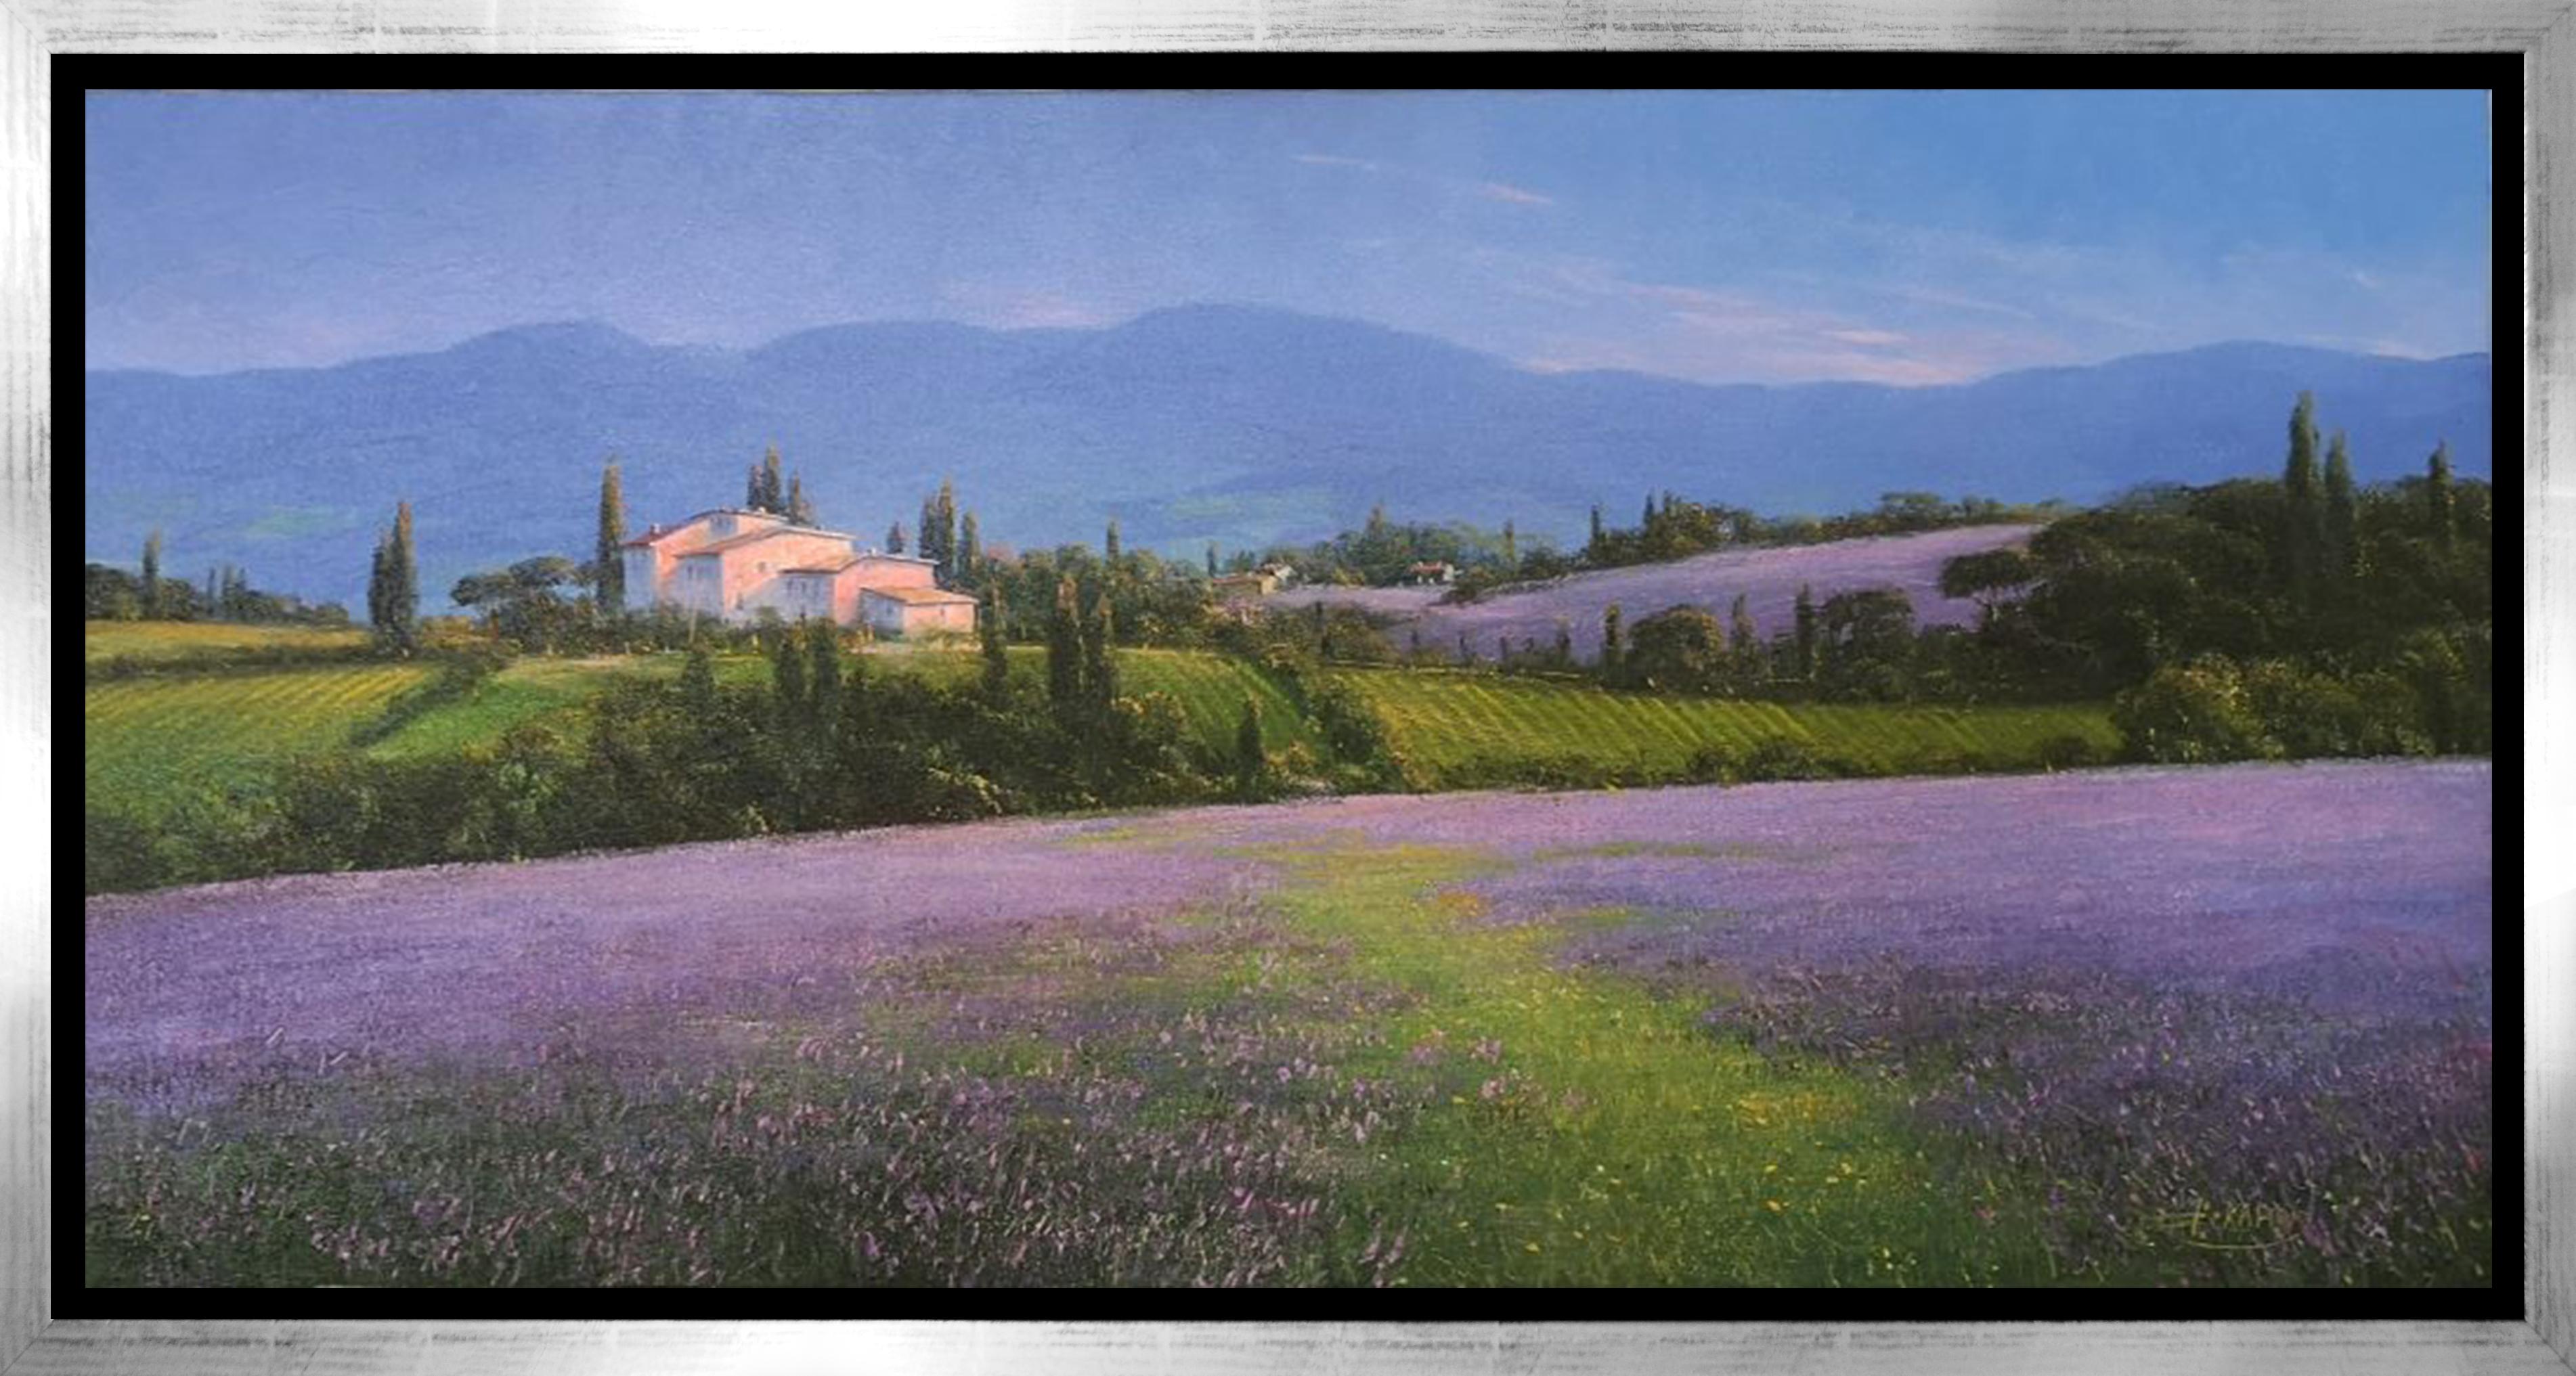 Detlef Rahn - Toskana / Lavendelfelder , 7840-006-184